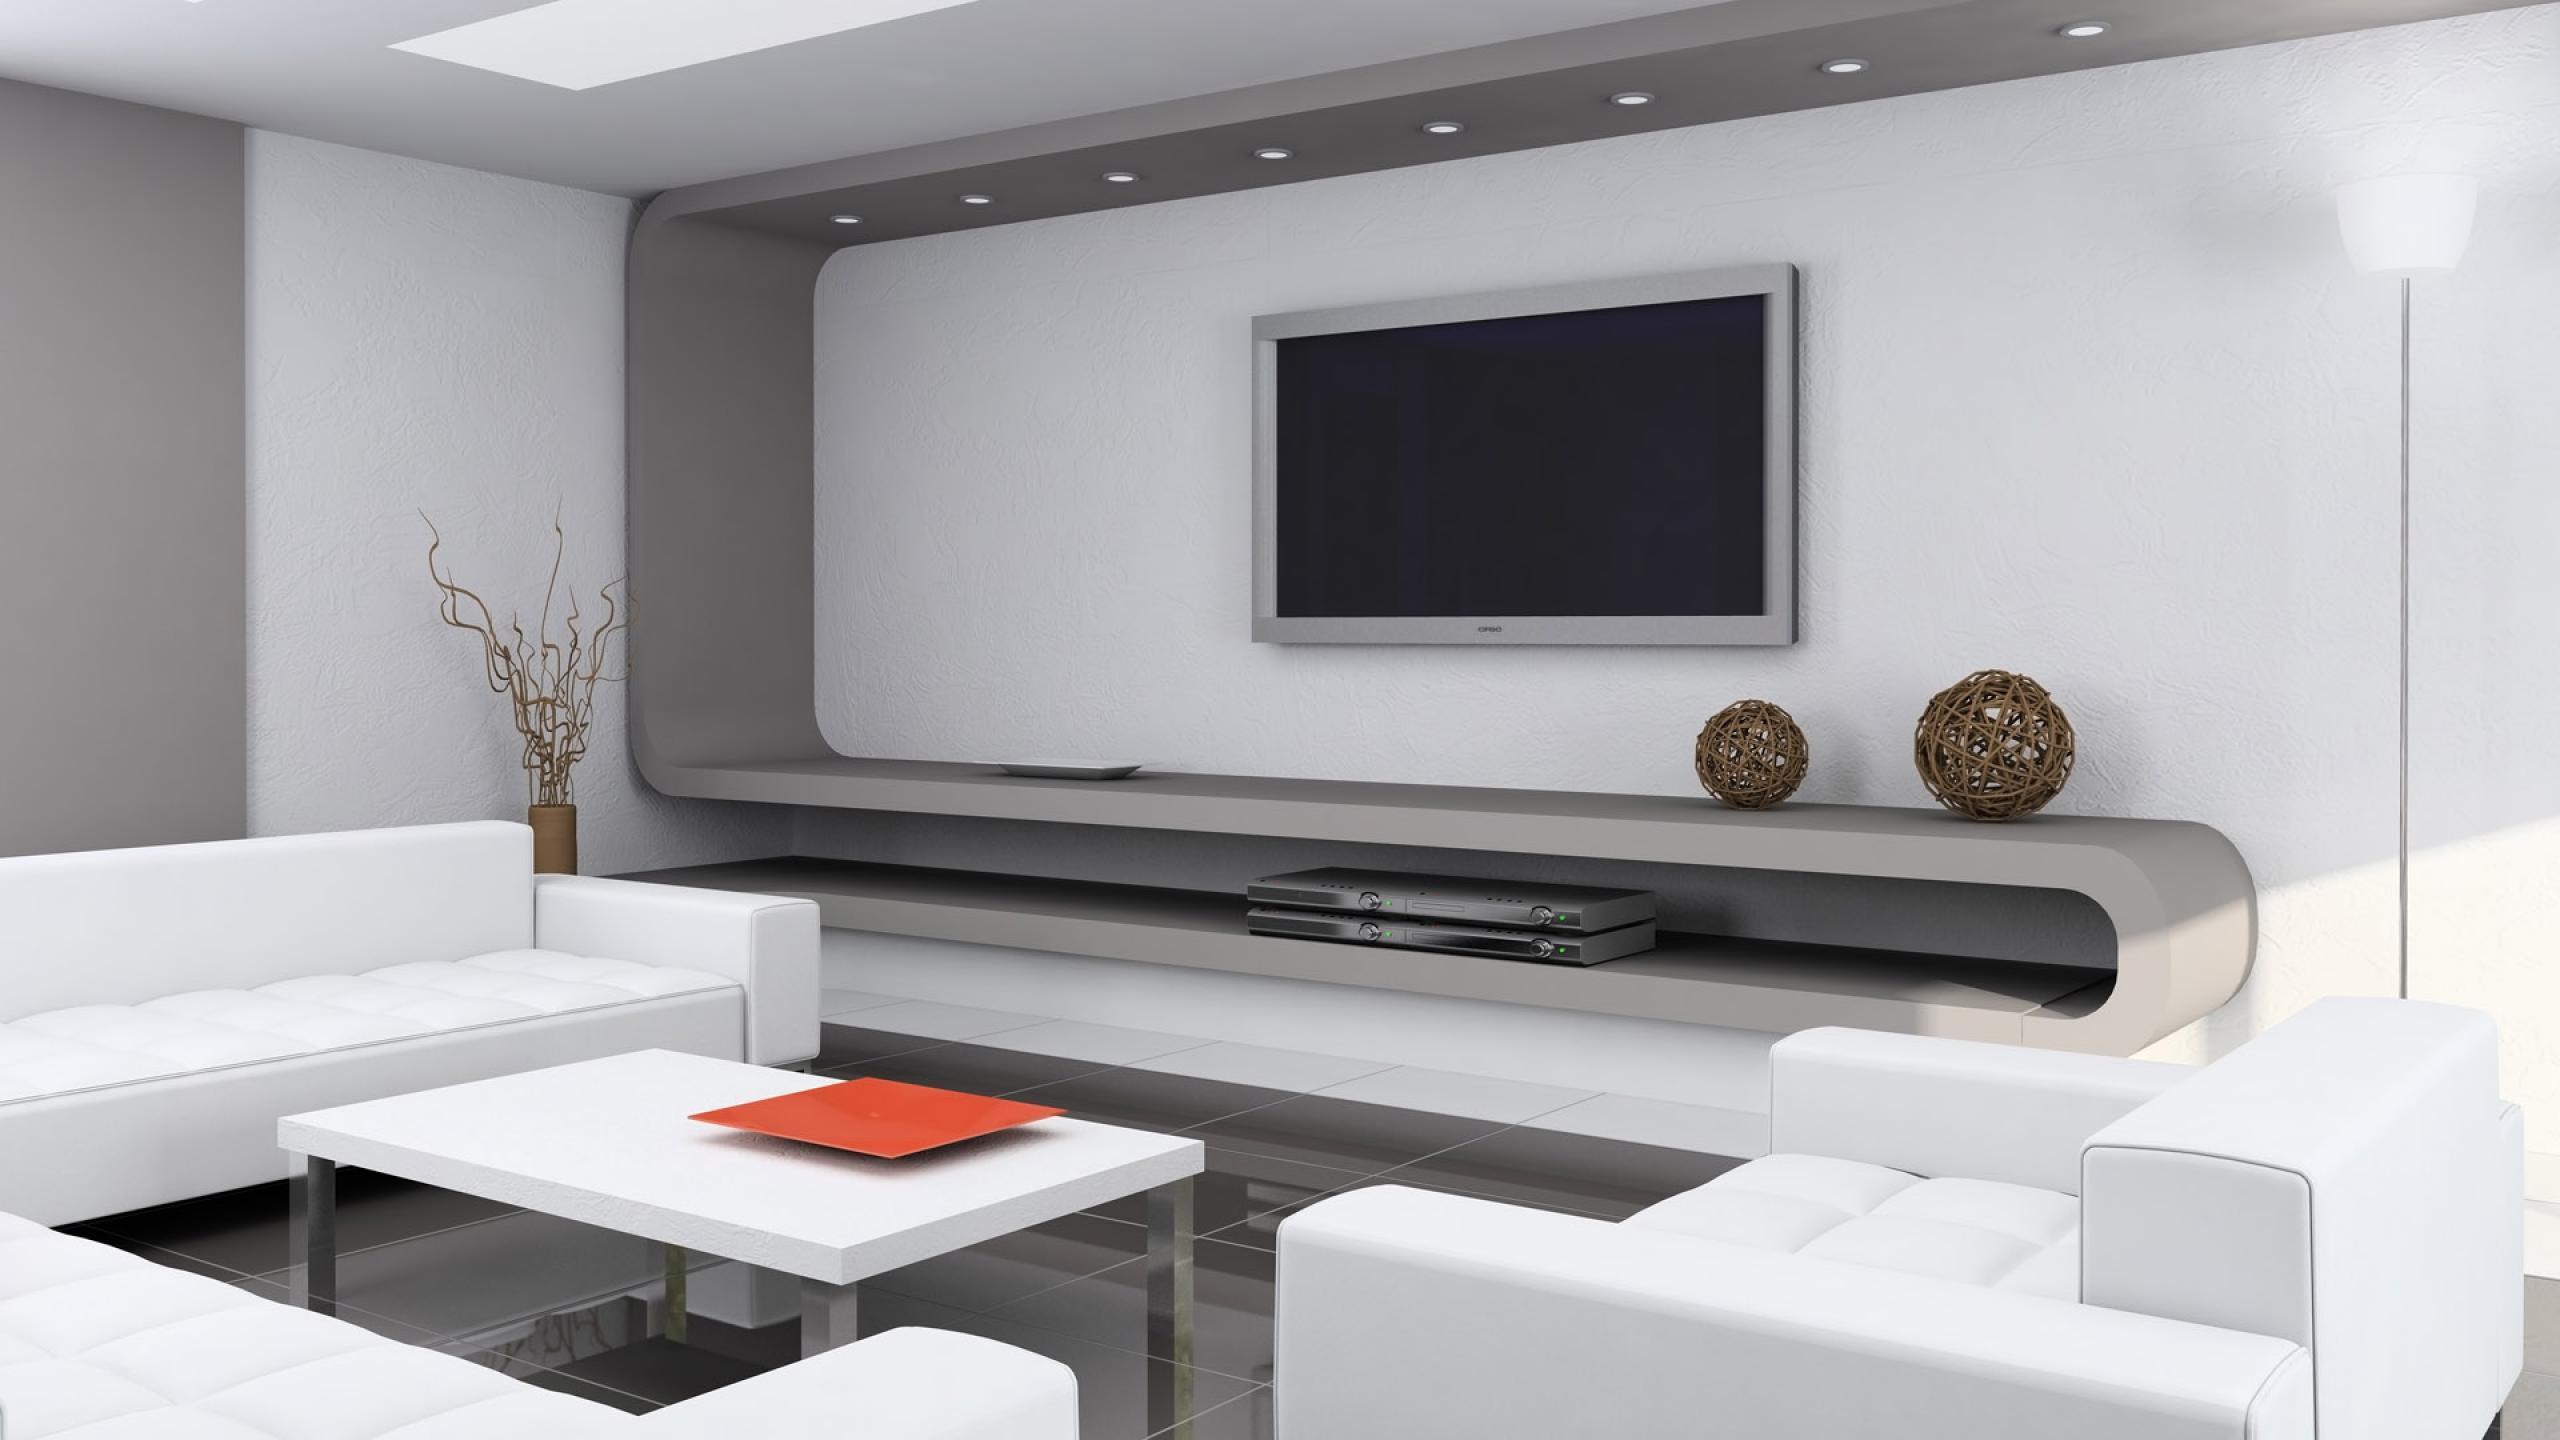 Wanddeko Draußen Genial Furniture Room Table Architecture Floor Wqhd Qhd 169